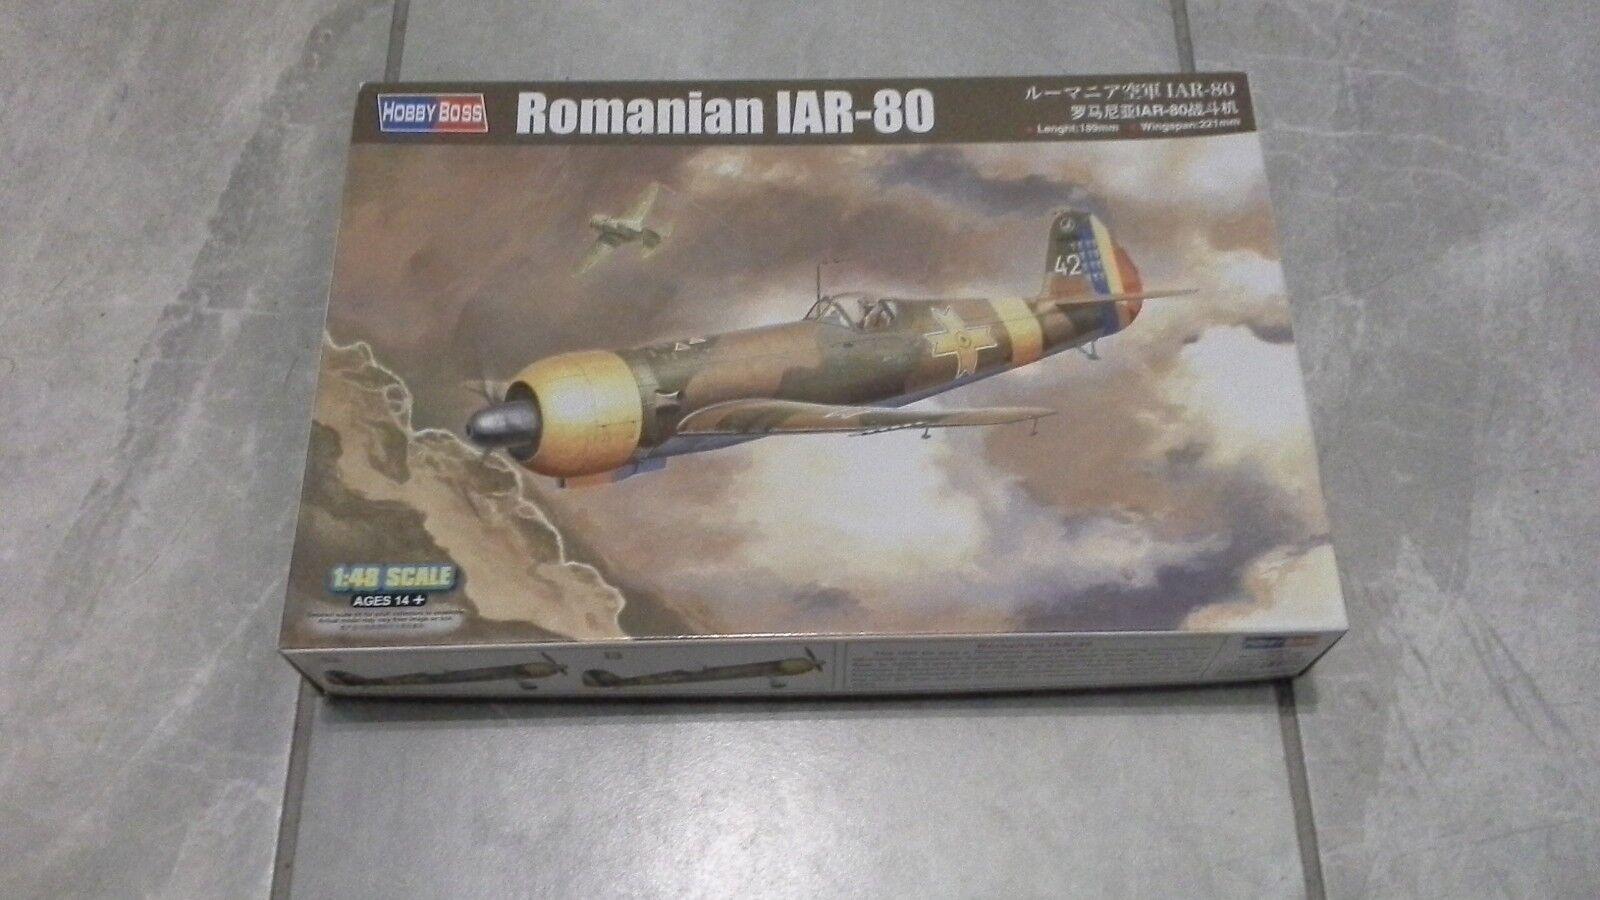 Hobbyboss 1 48 romanian iar 80